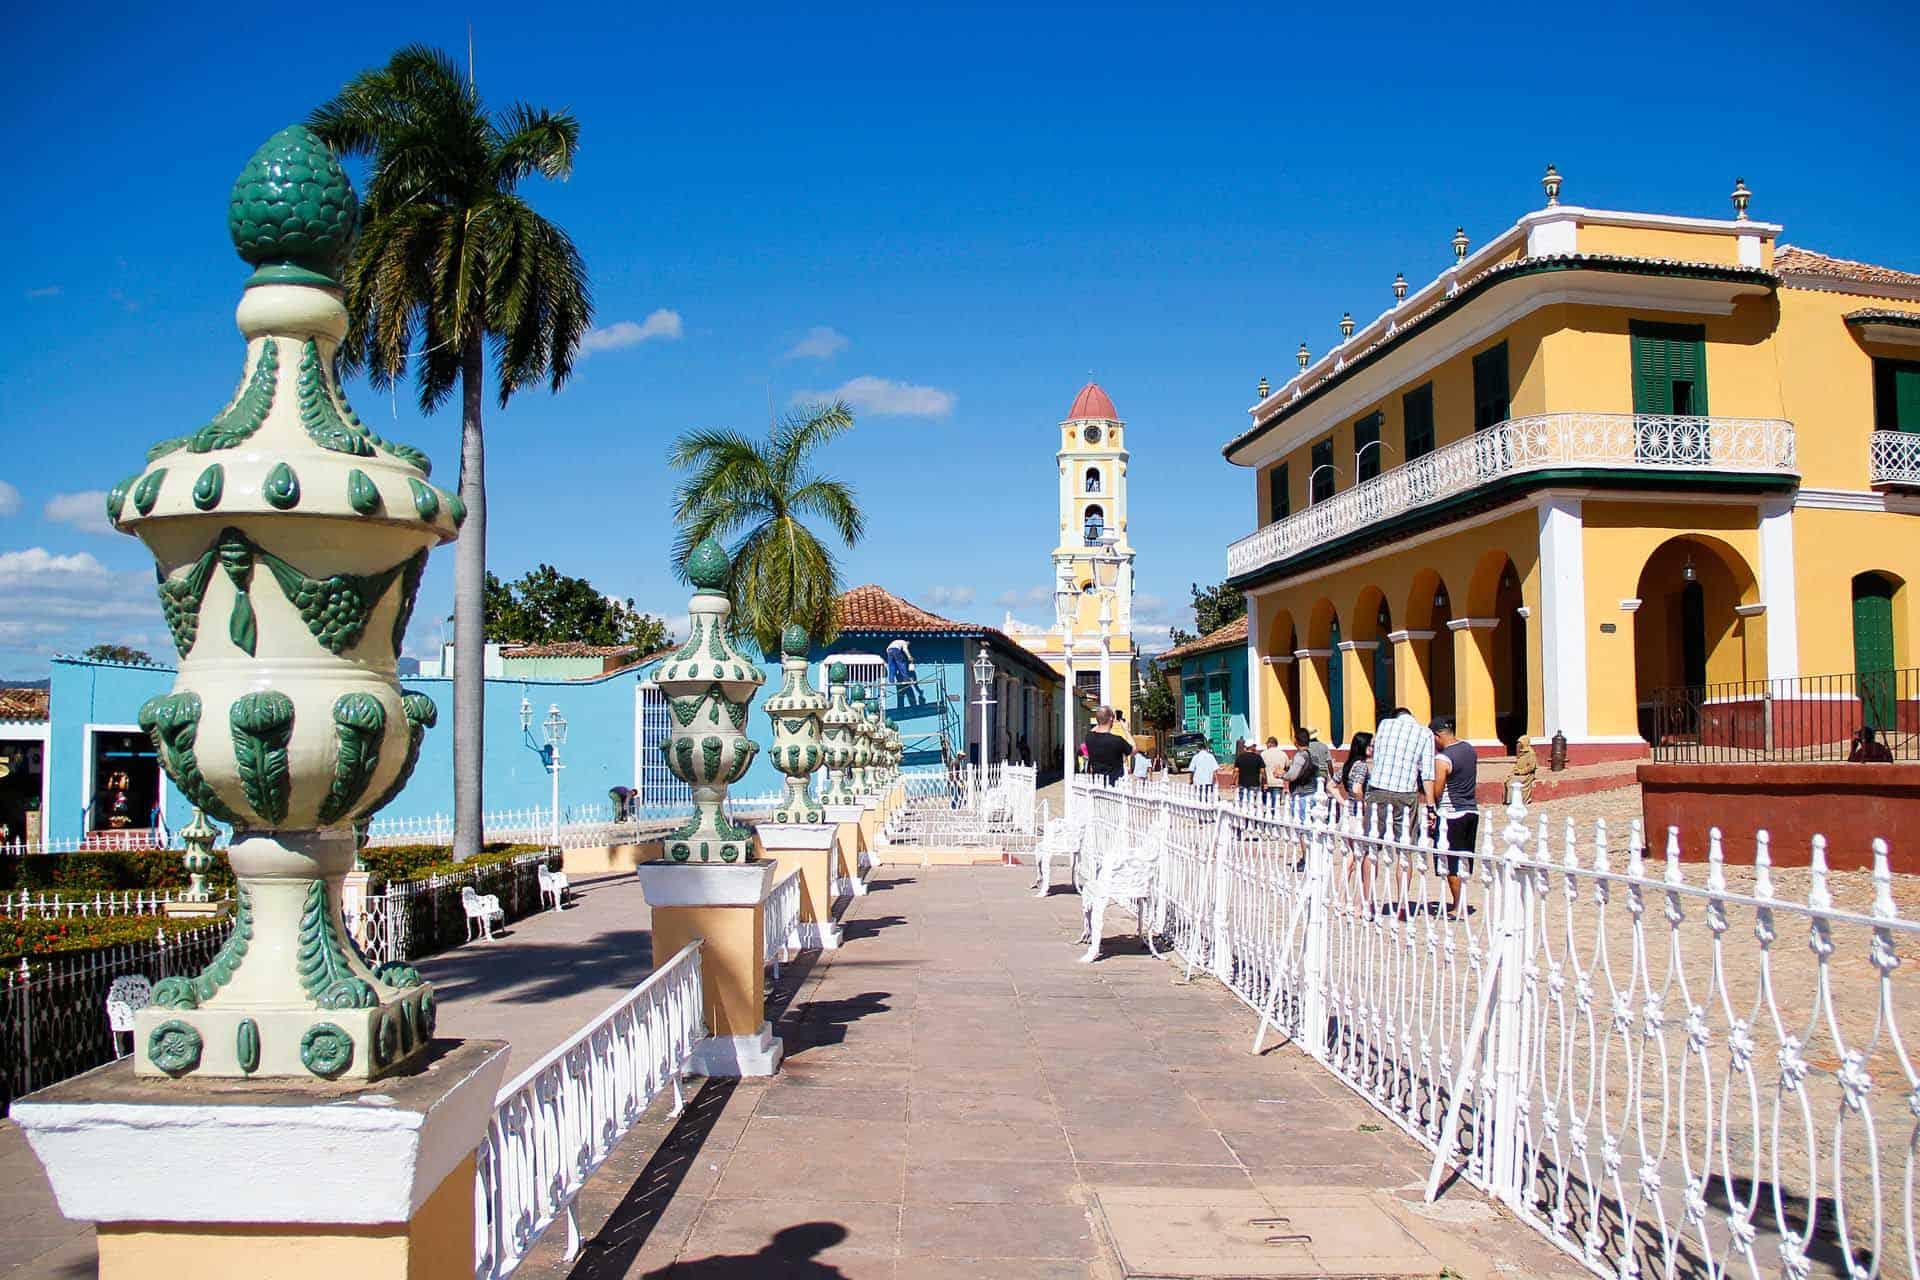 trinidad plaza mayor batiment colonial eglise cuba autrement